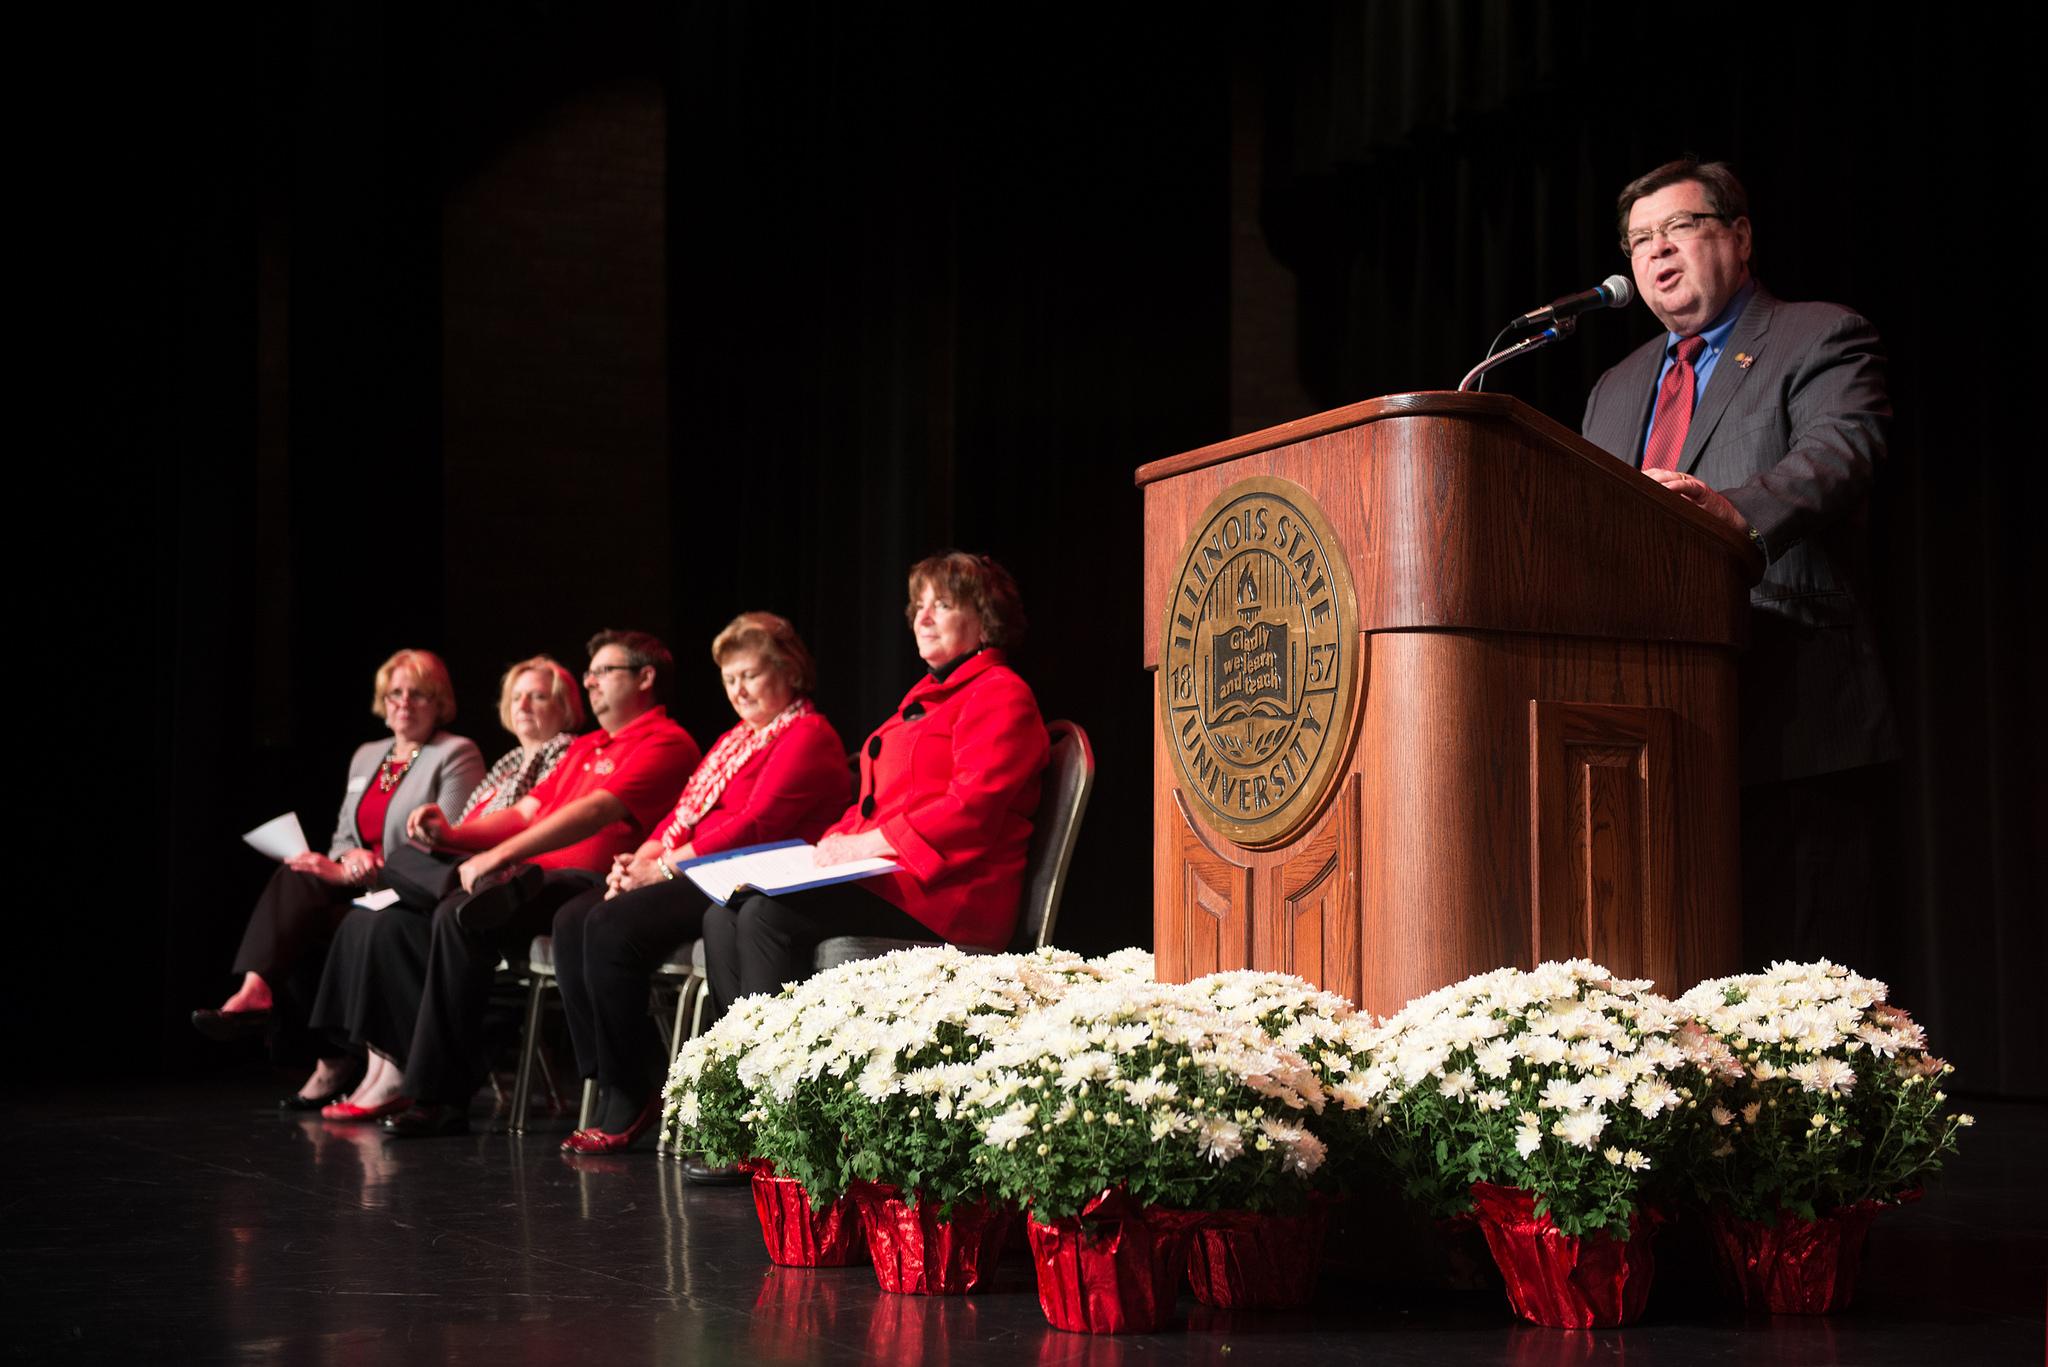 Larry Dietz speaks at podium